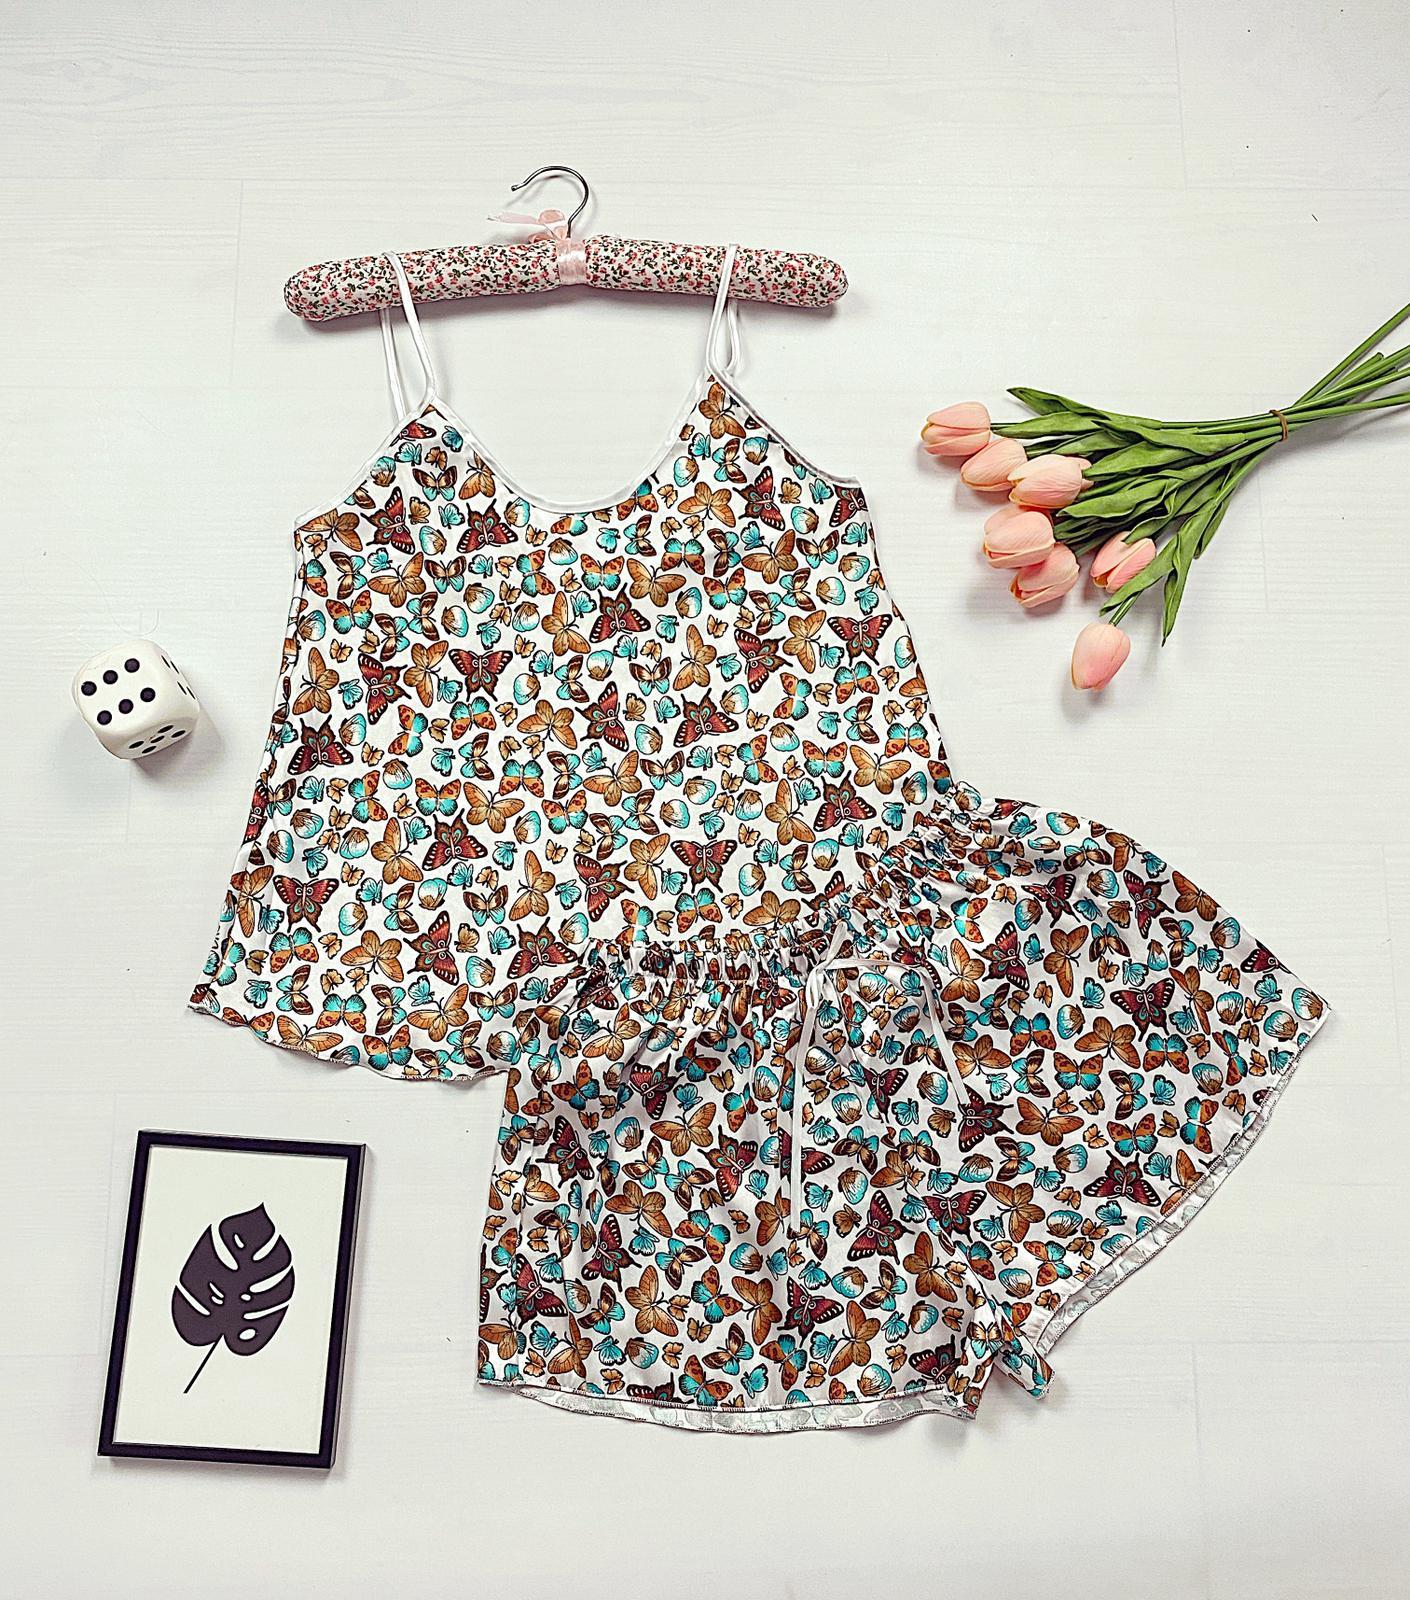 Compleu pijama set maiou si pantaloni scurti din satin premium alb cu imprimeu fluturi multicolori